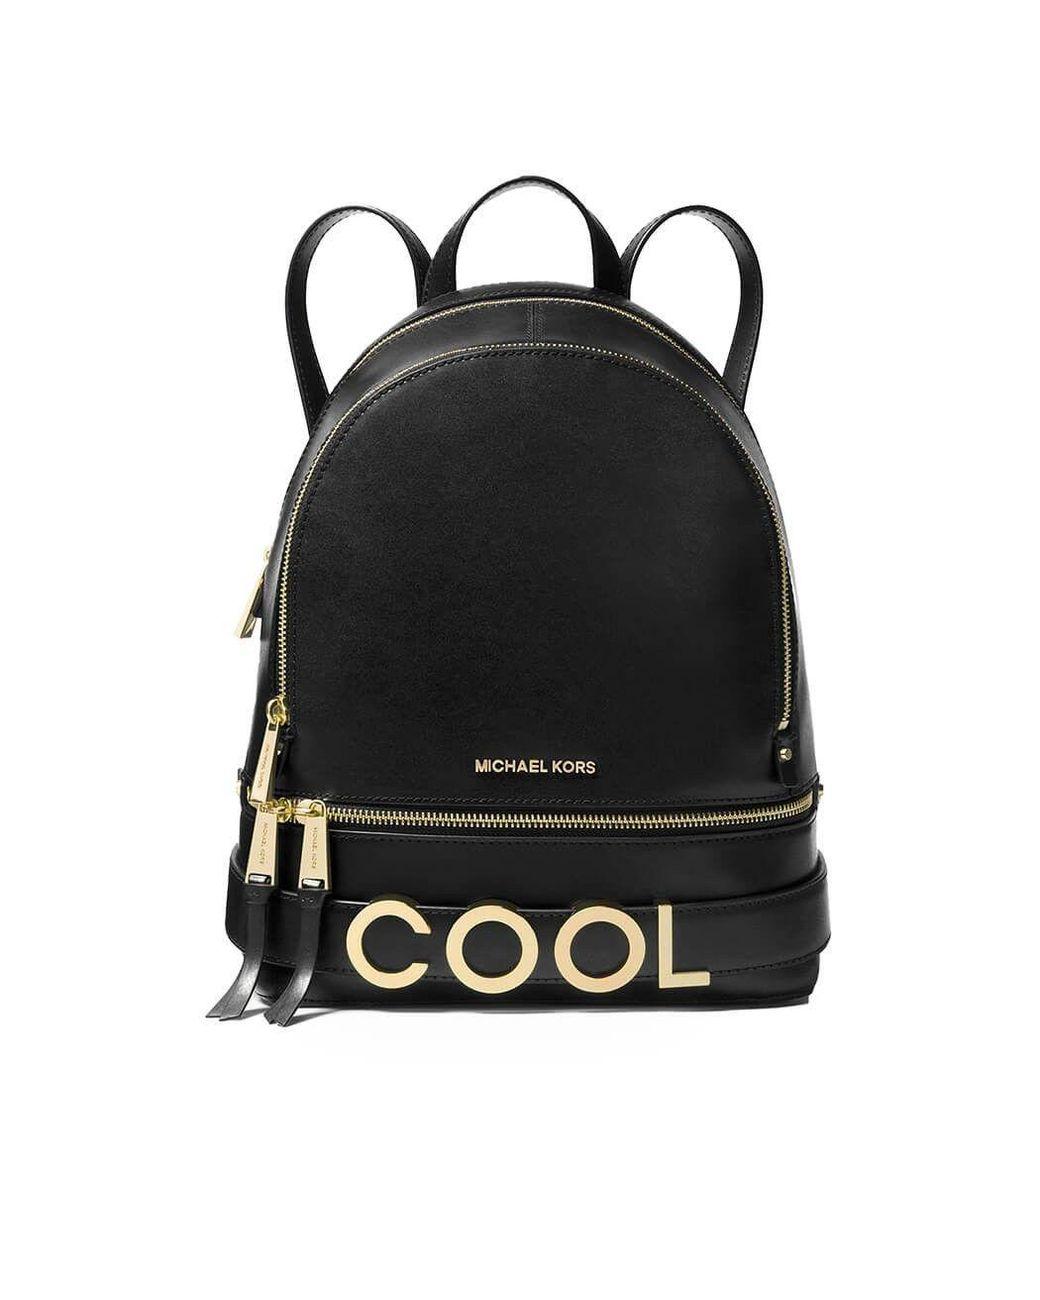 d5ba7345331d Lyst - Michael Kors Rhea Medium Embellished Leather Backpack in Black -  Save 55%